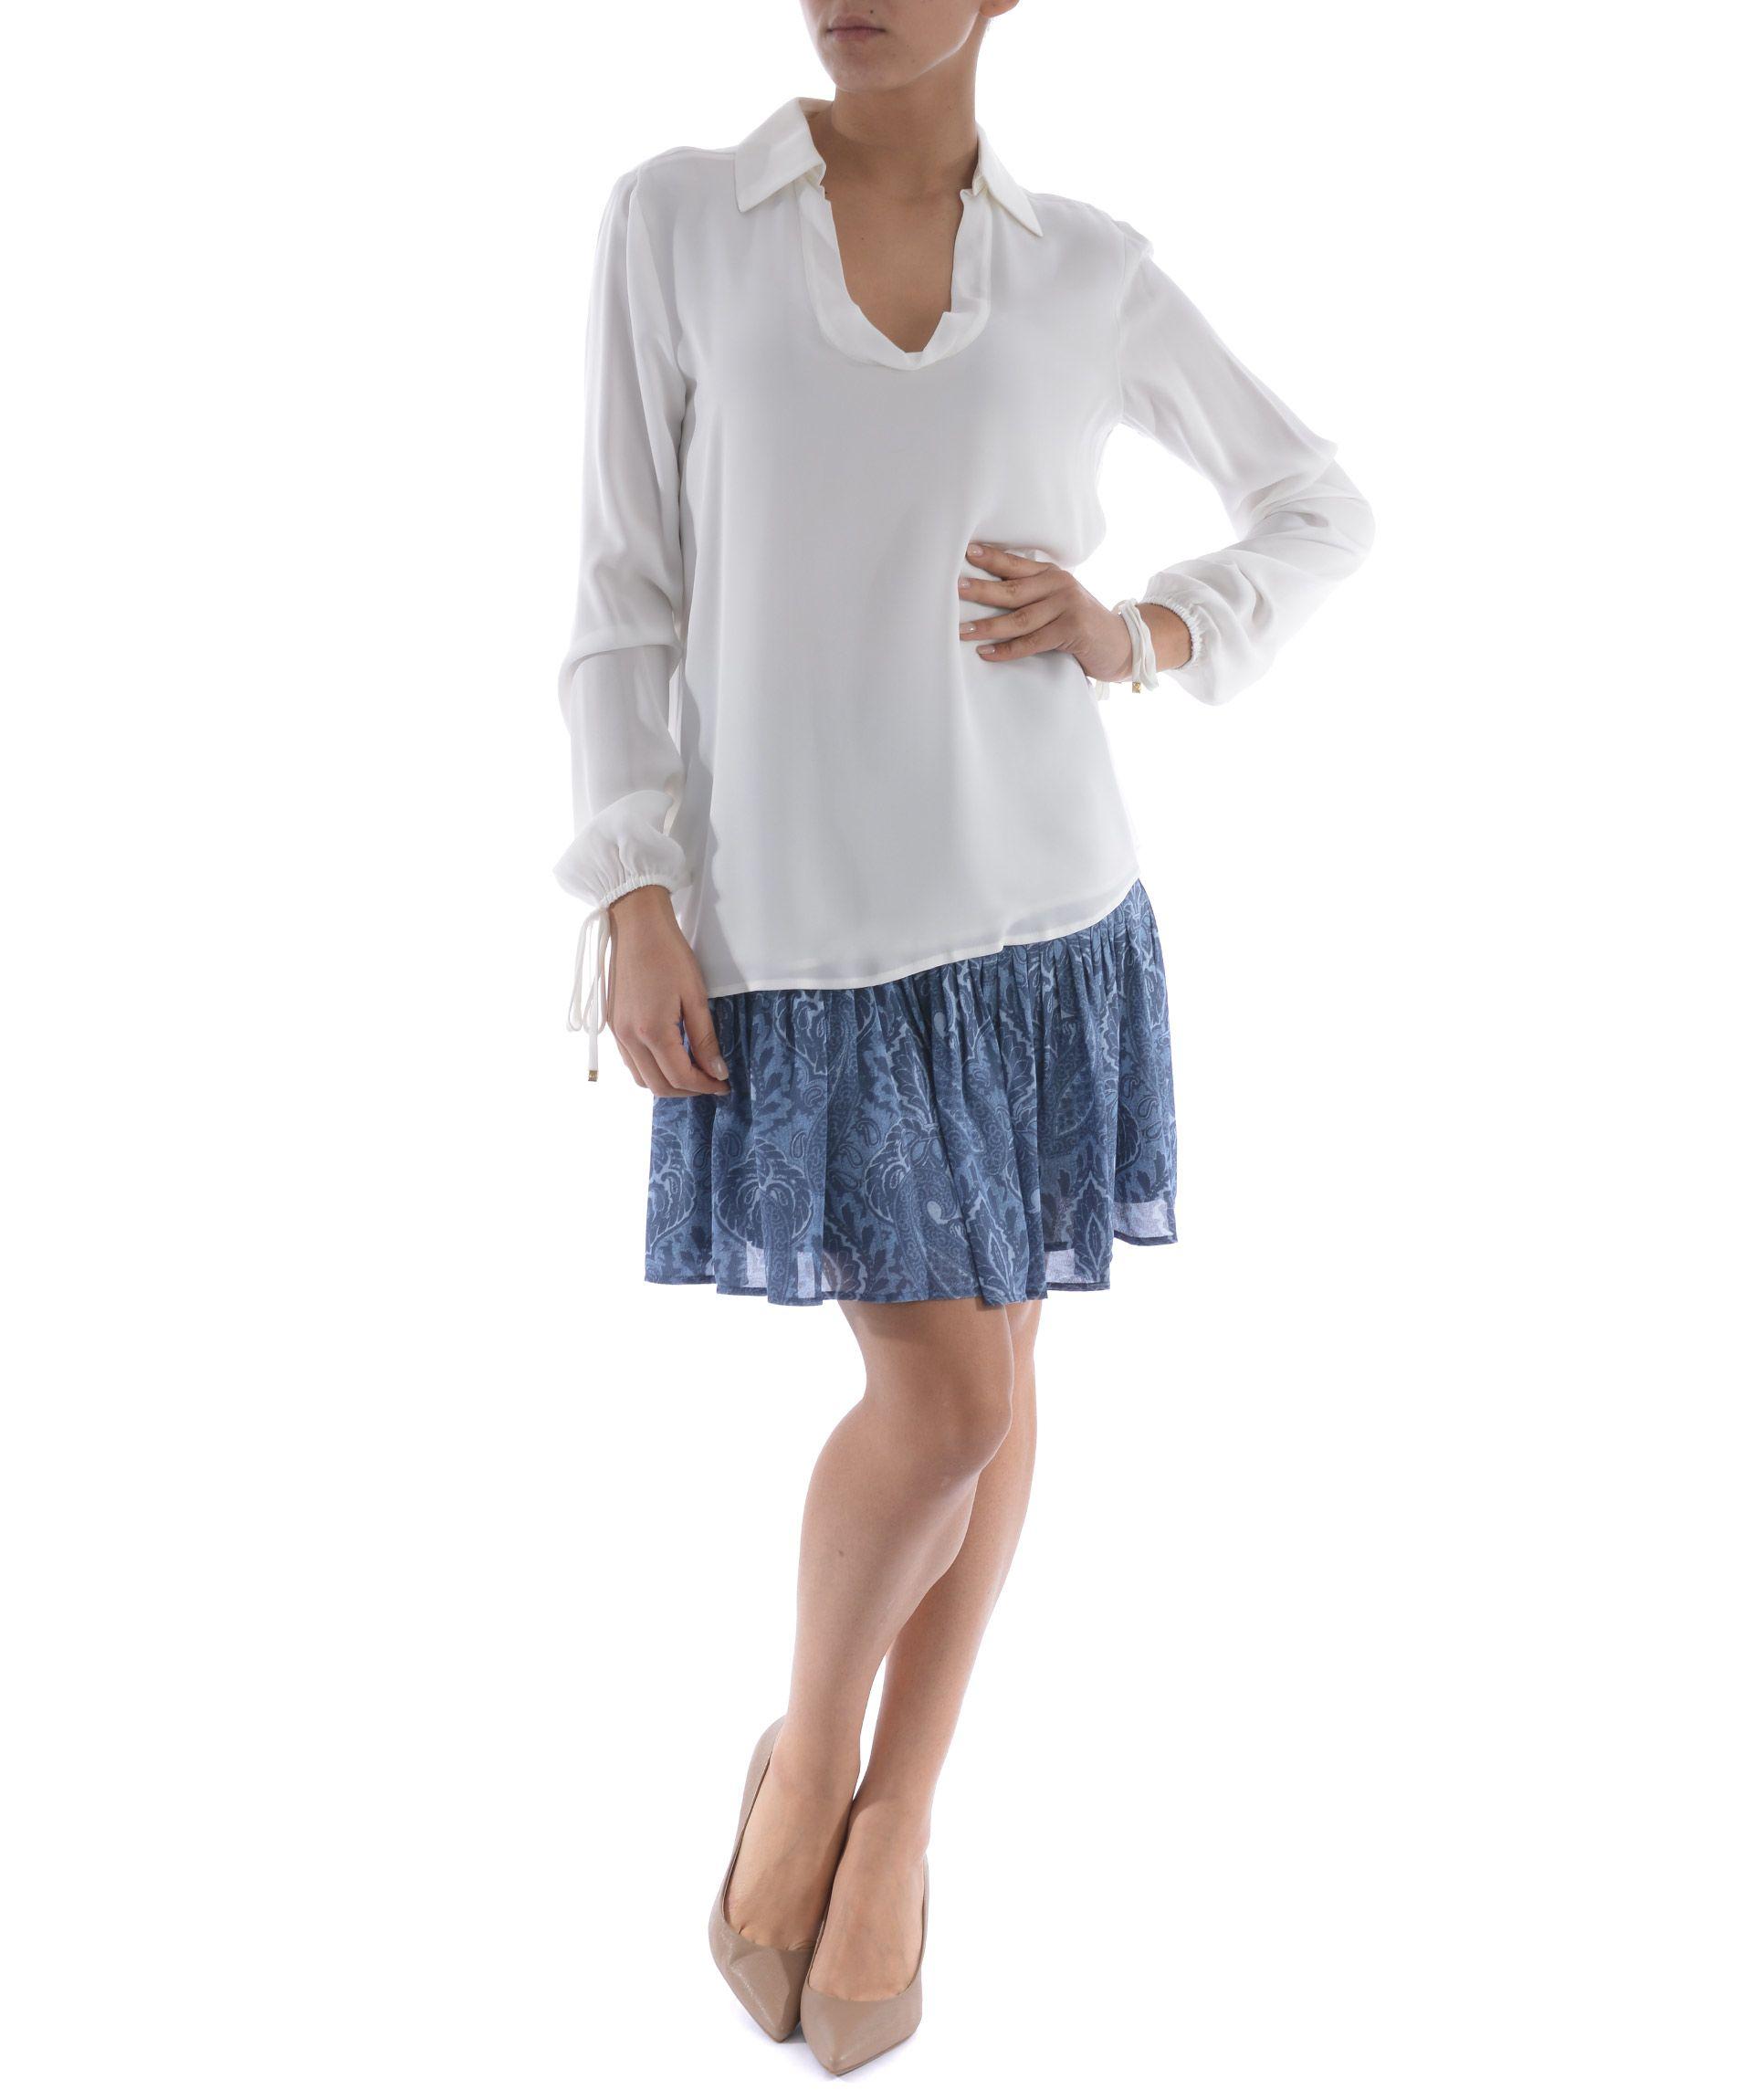 michael kors michael kors silk blouse bianco latte women 39 s bluse italist. Black Bedroom Furniture Sets. Home Design Ideas